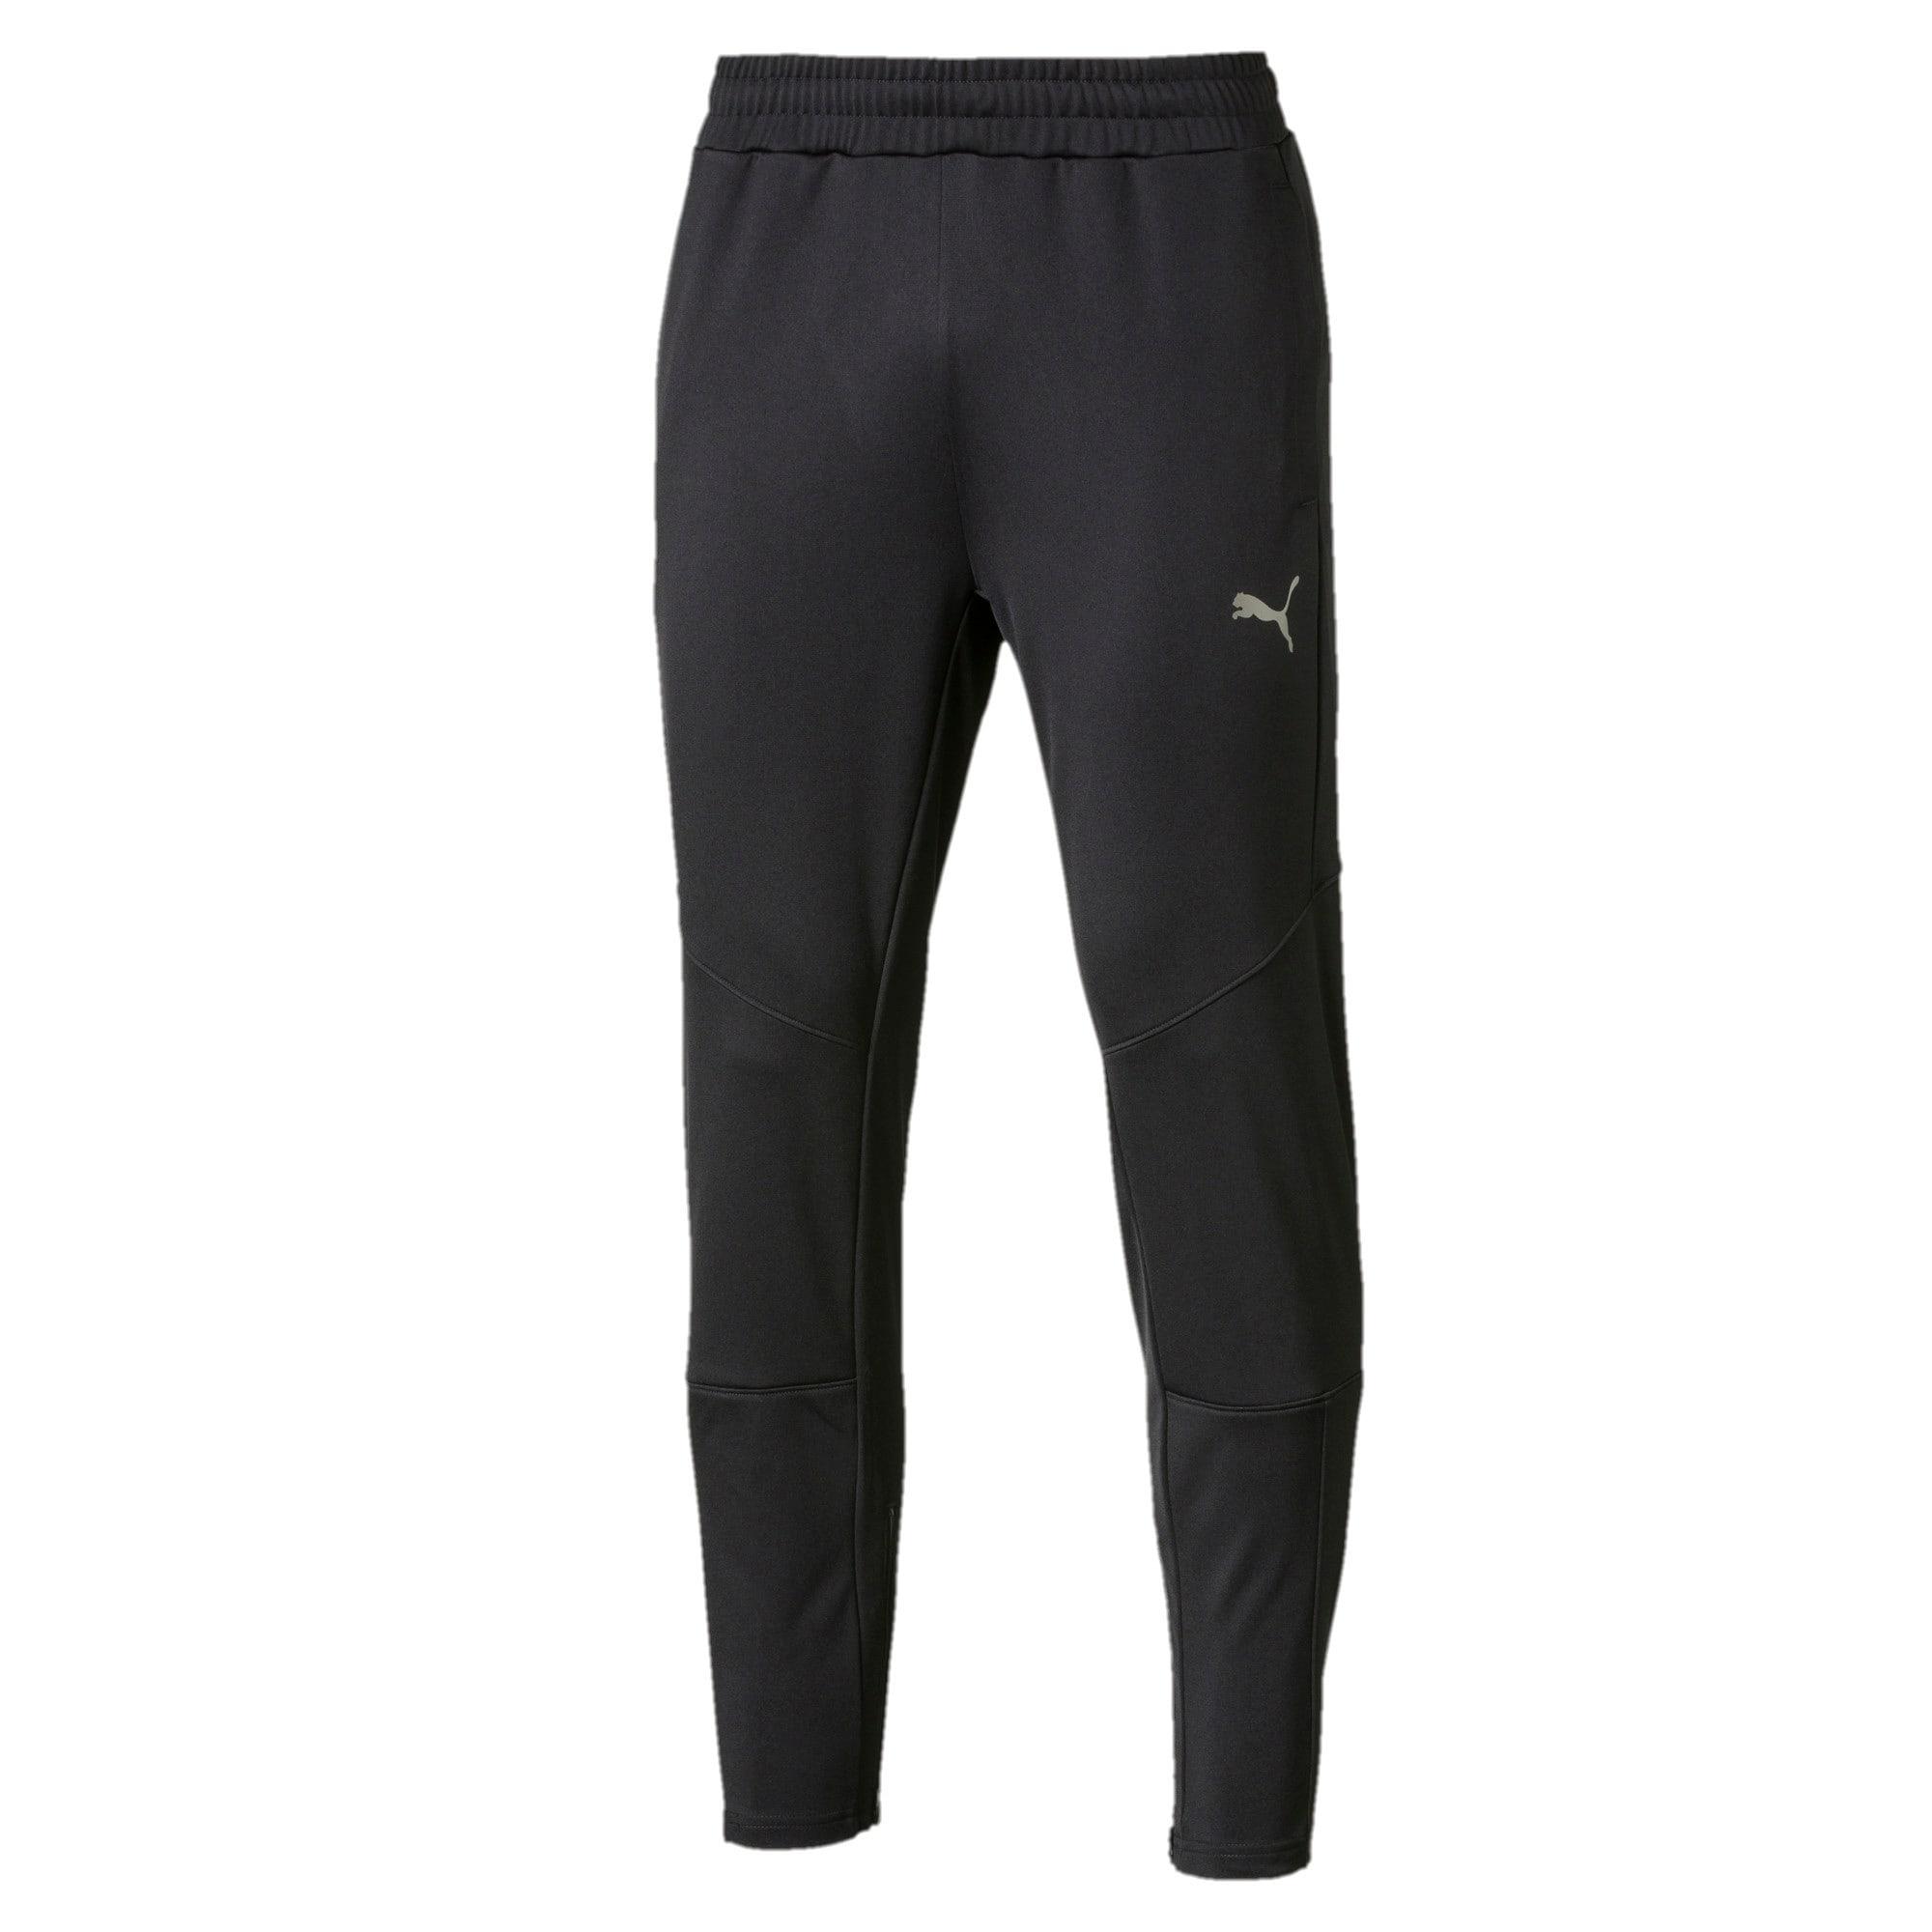 Thumbnail 1 of PUMA Blaster Men's Pants, Puma Black, medium